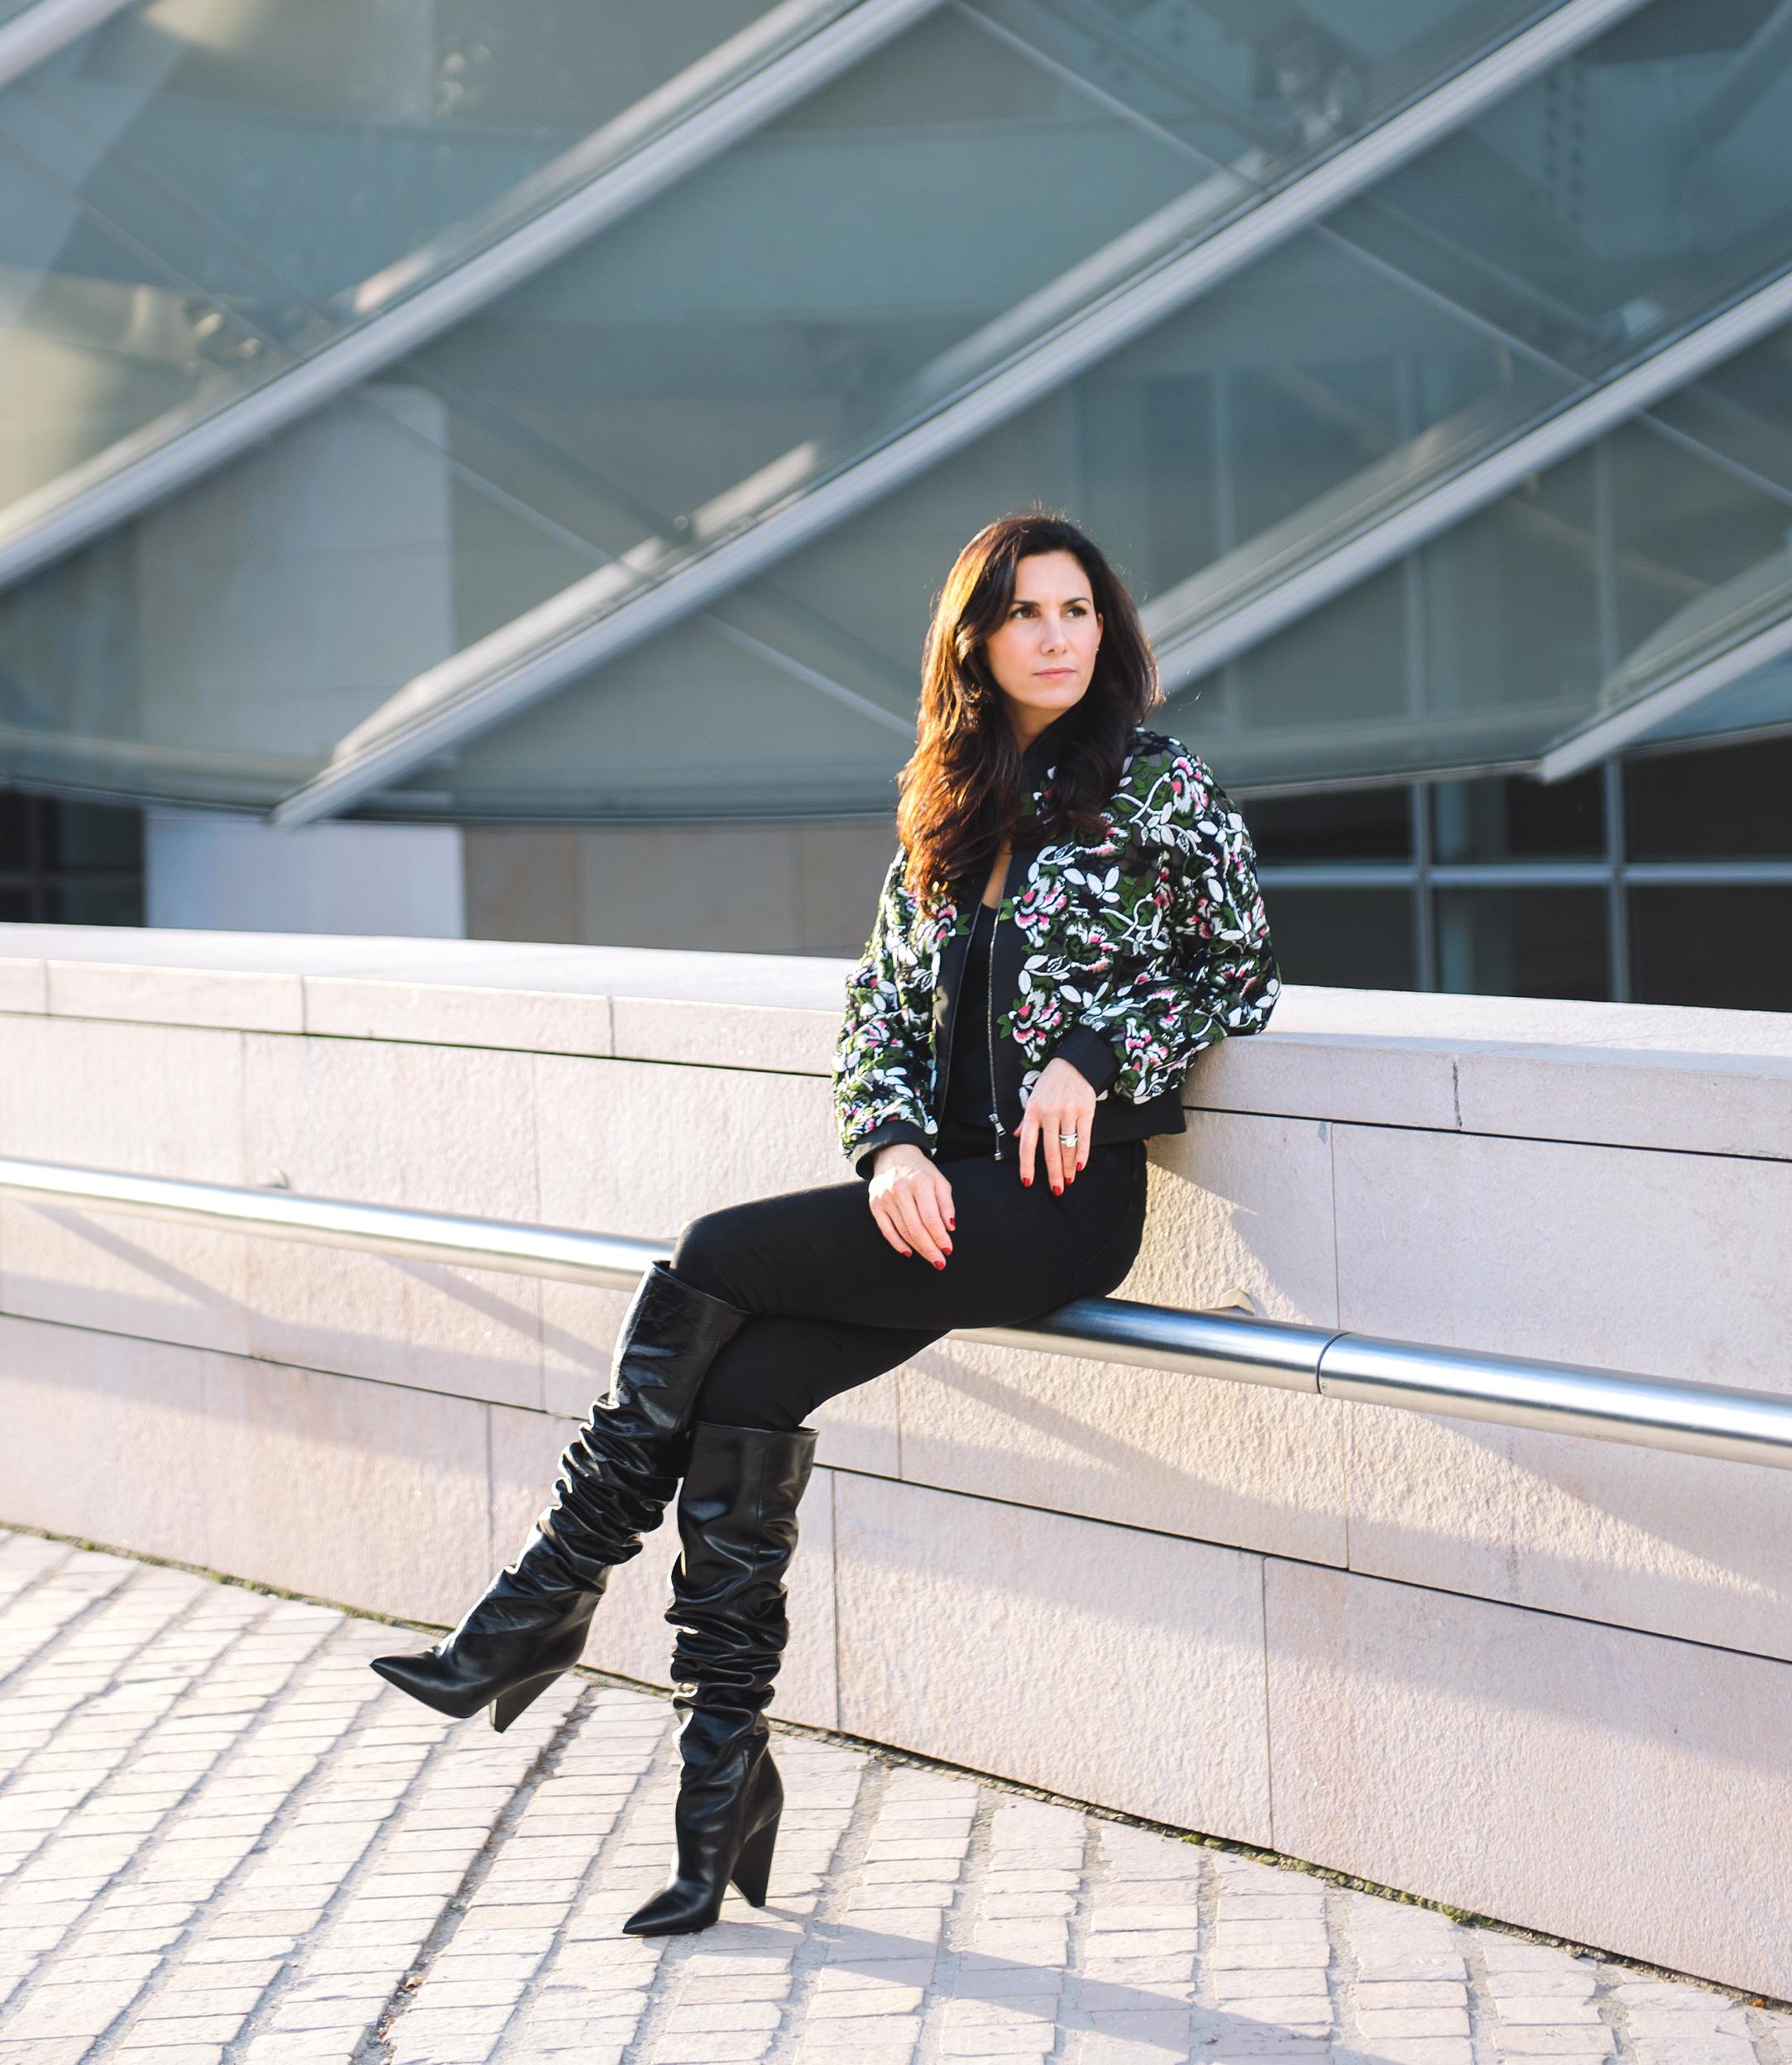 ElisabethJonesHennssy-FoundationLouisVuitton-MomaParis-02.jpg